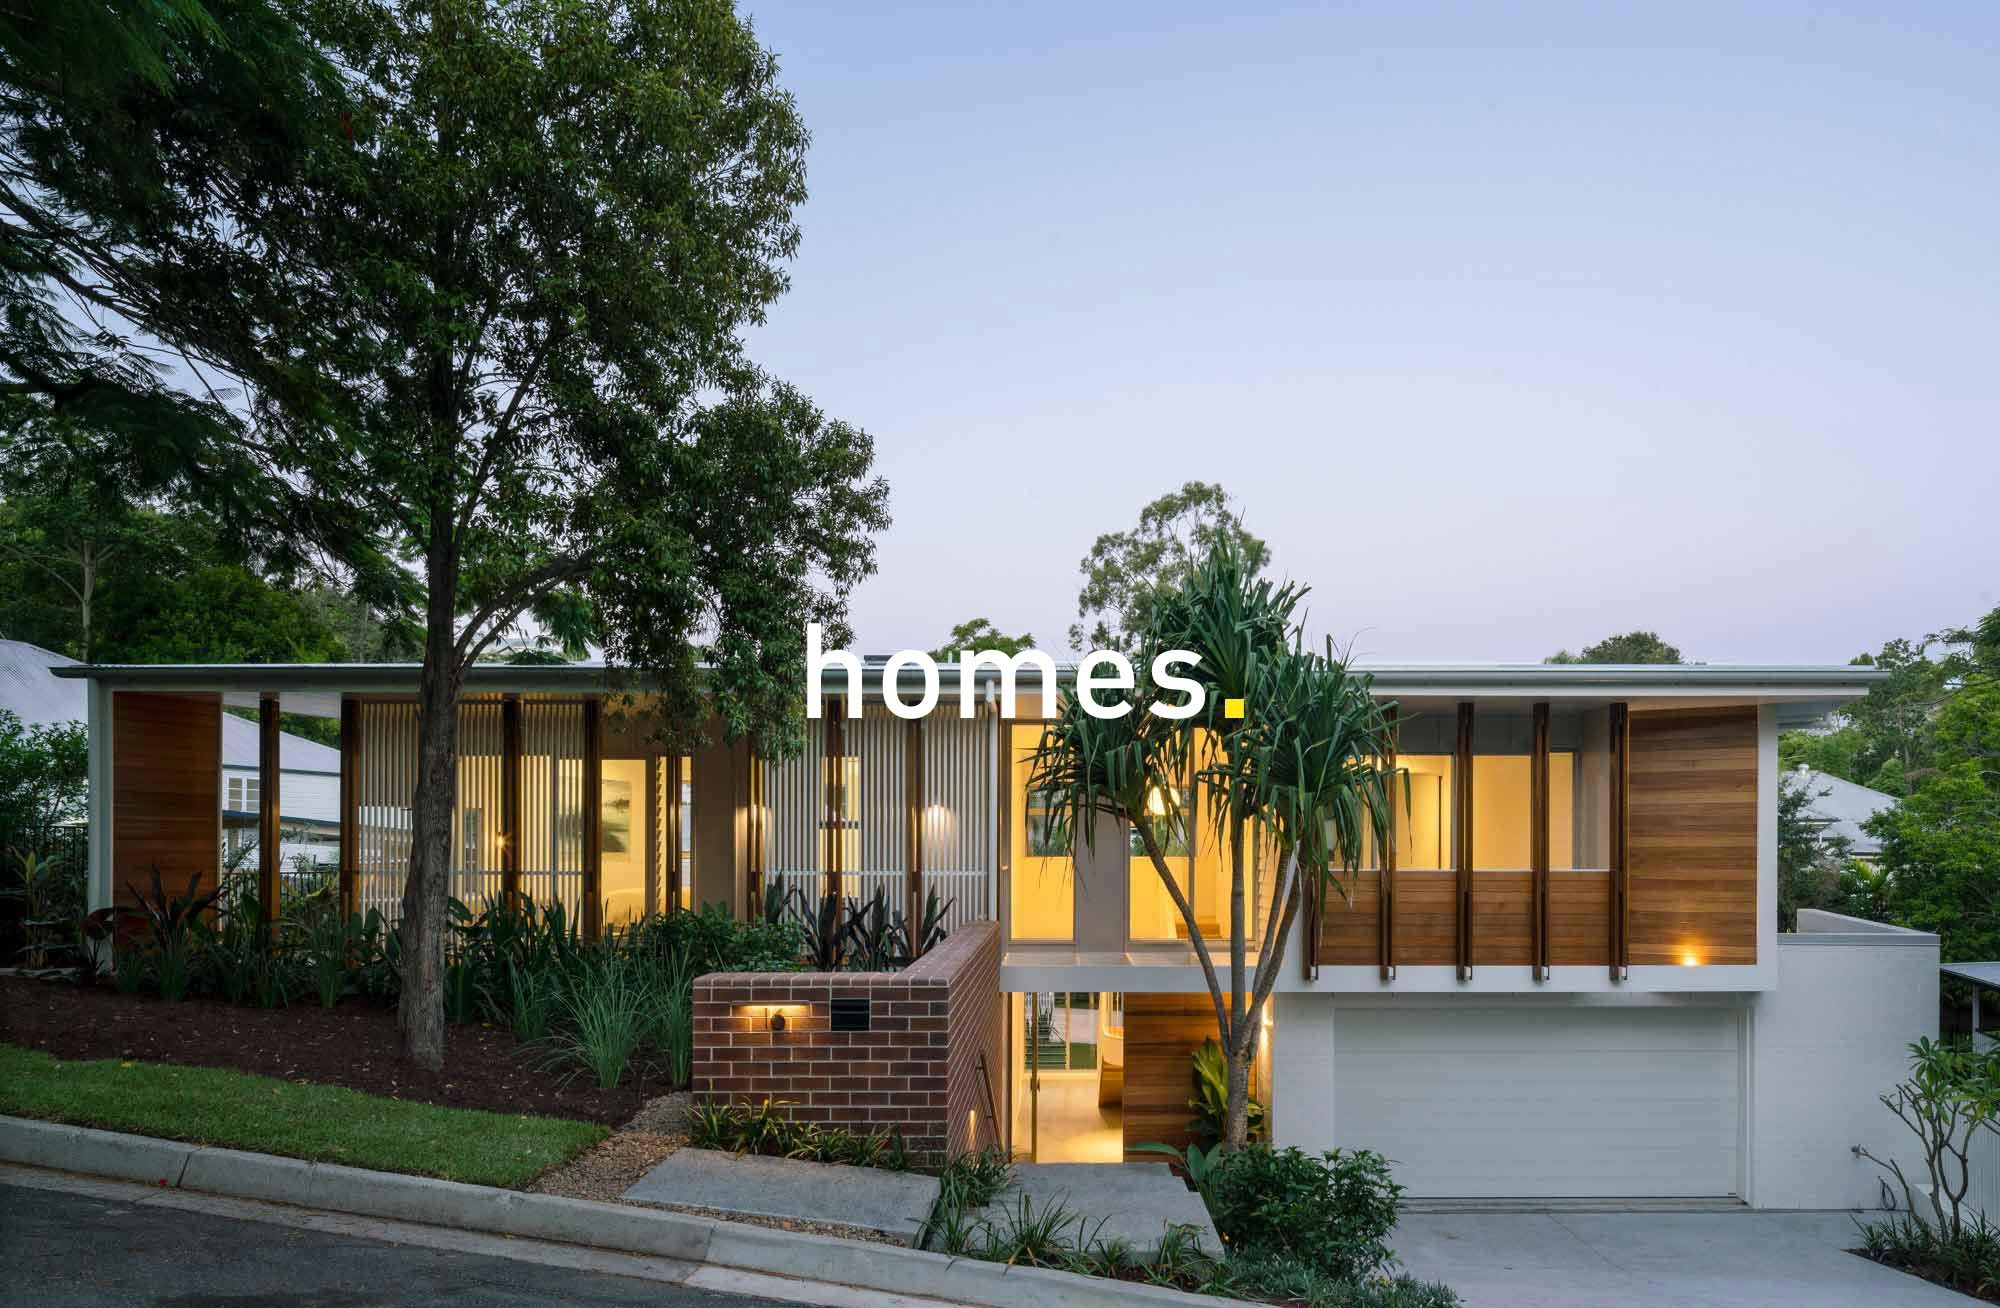 homes_01.jpg